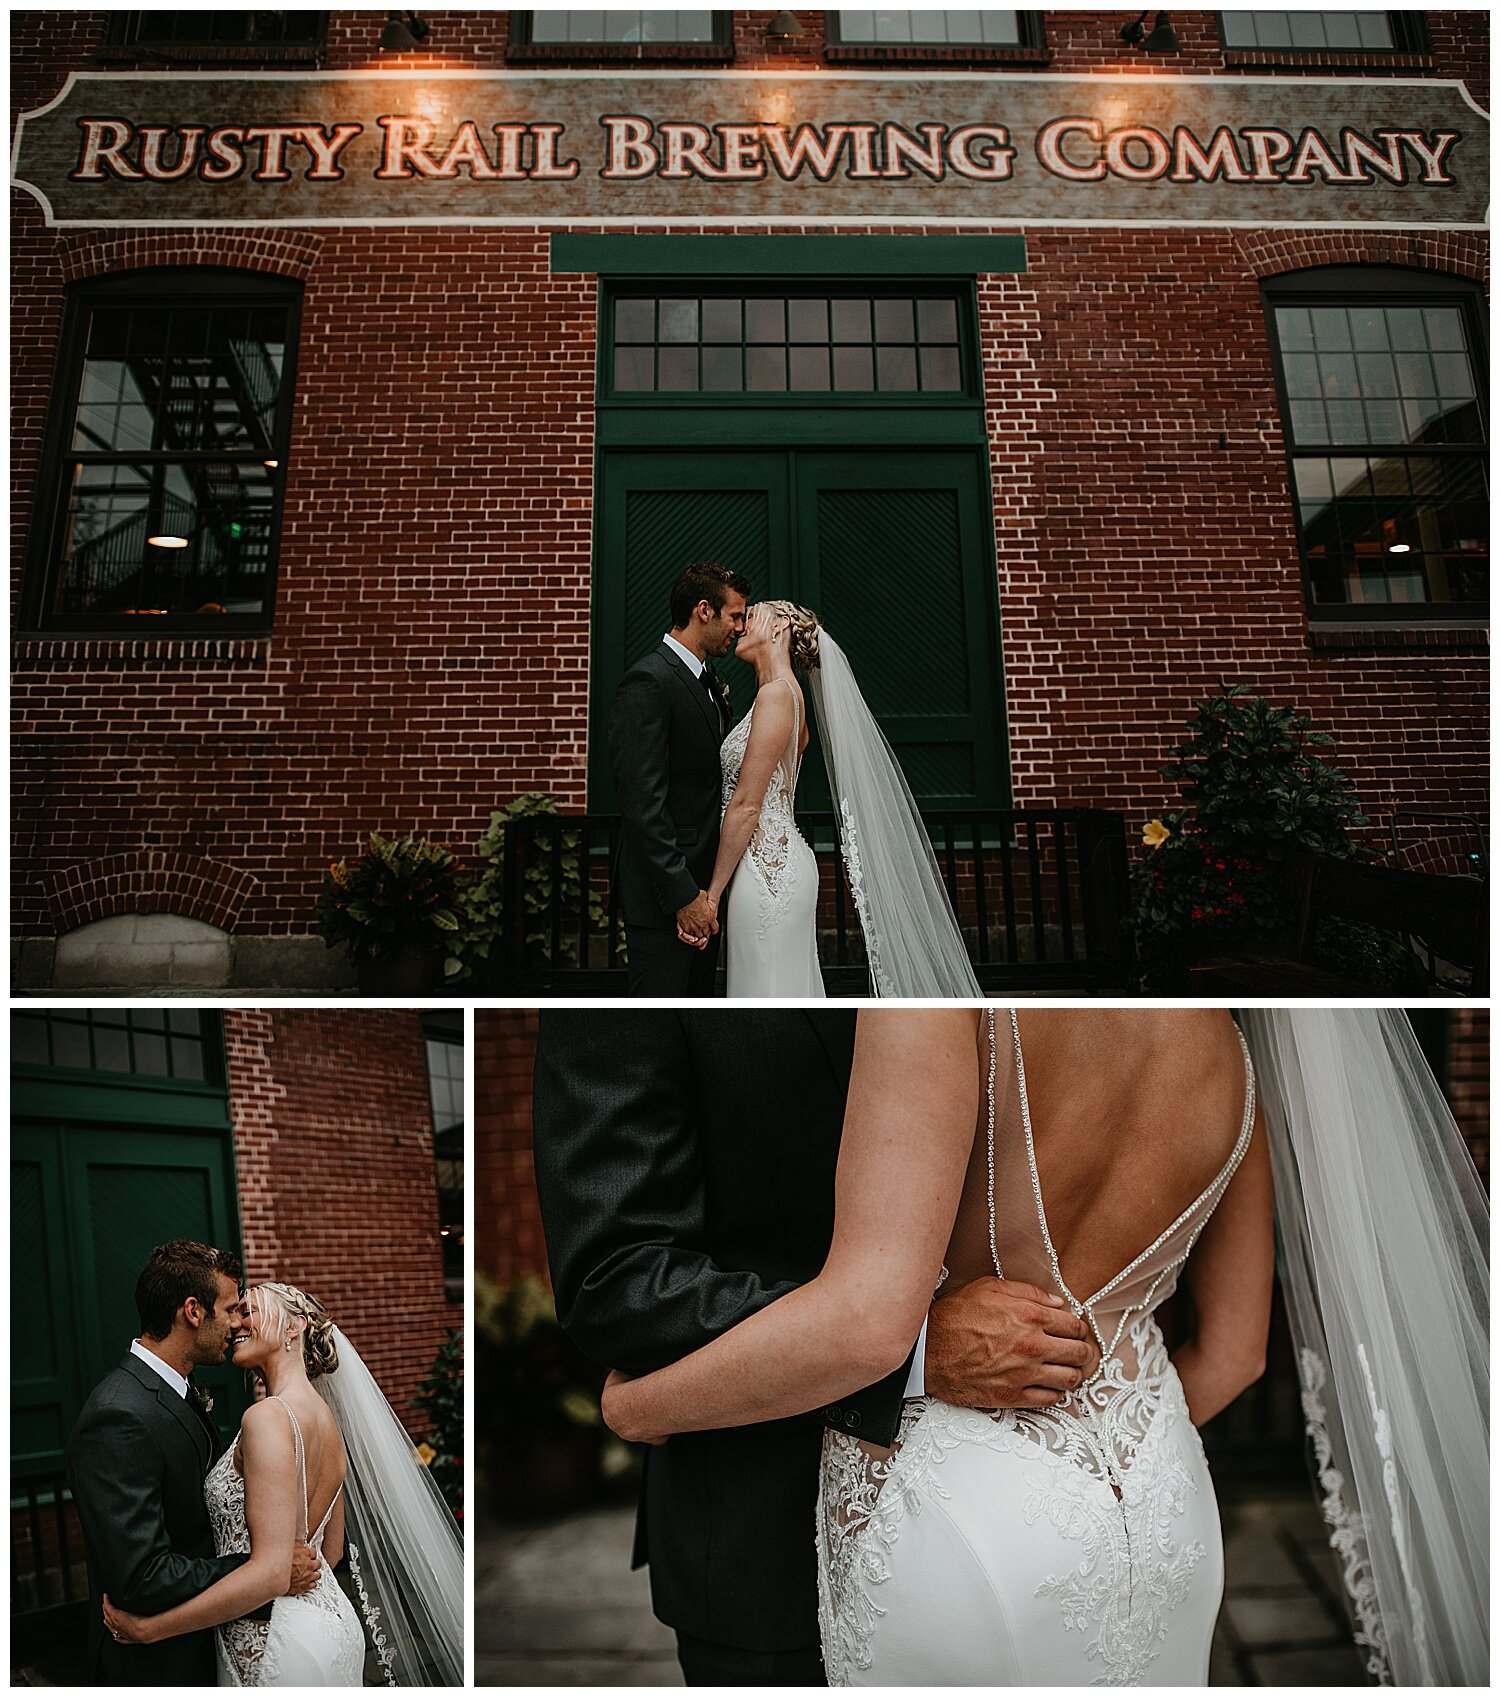 NEPA-Lewisburg-Wedding-Photographer-at-the-Rusty-Rail_0056.jpg